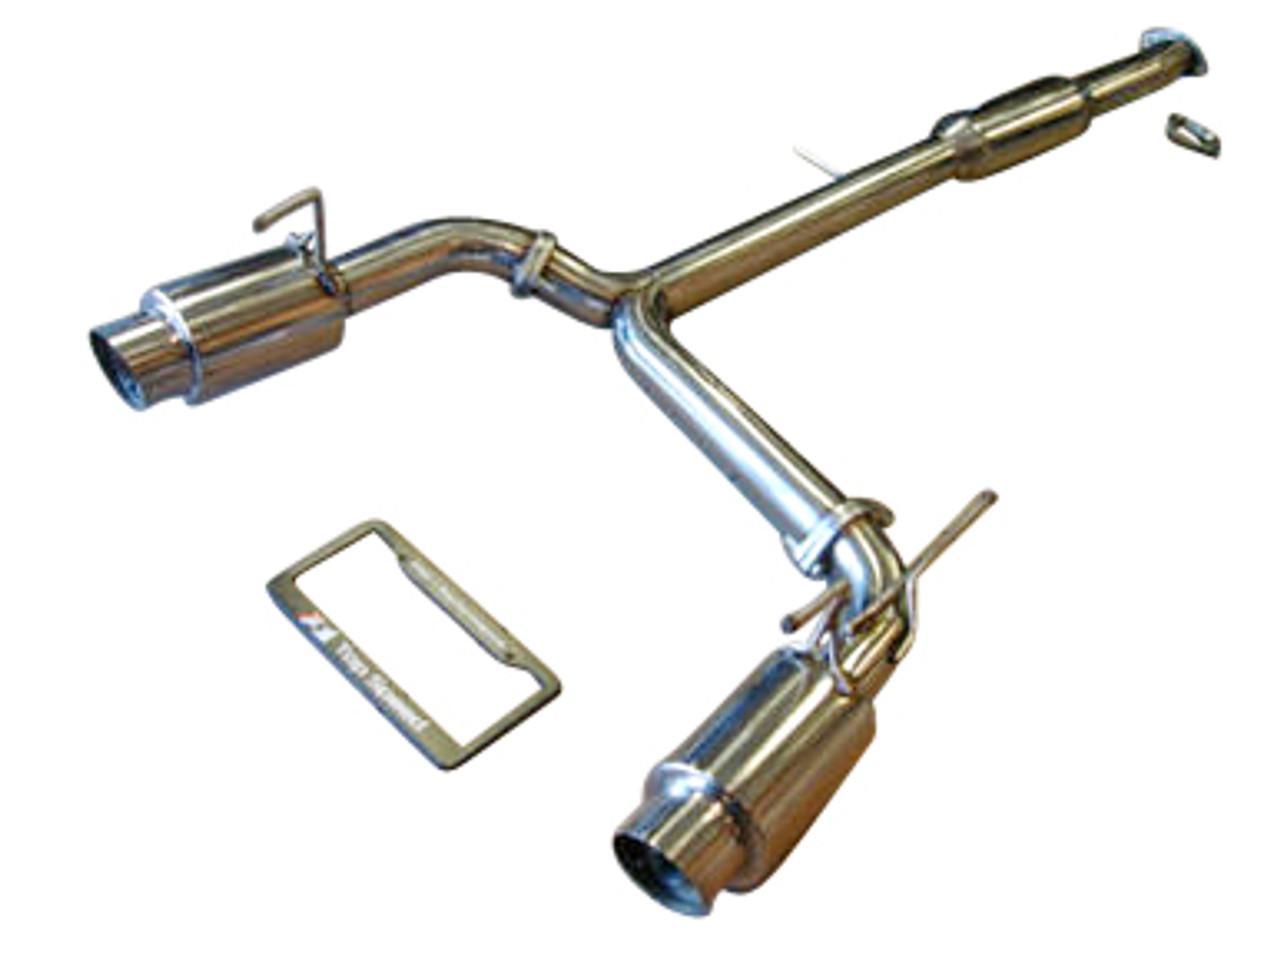 infiniti g35 coupe 03 07 mid resonator catback performance exhaust system